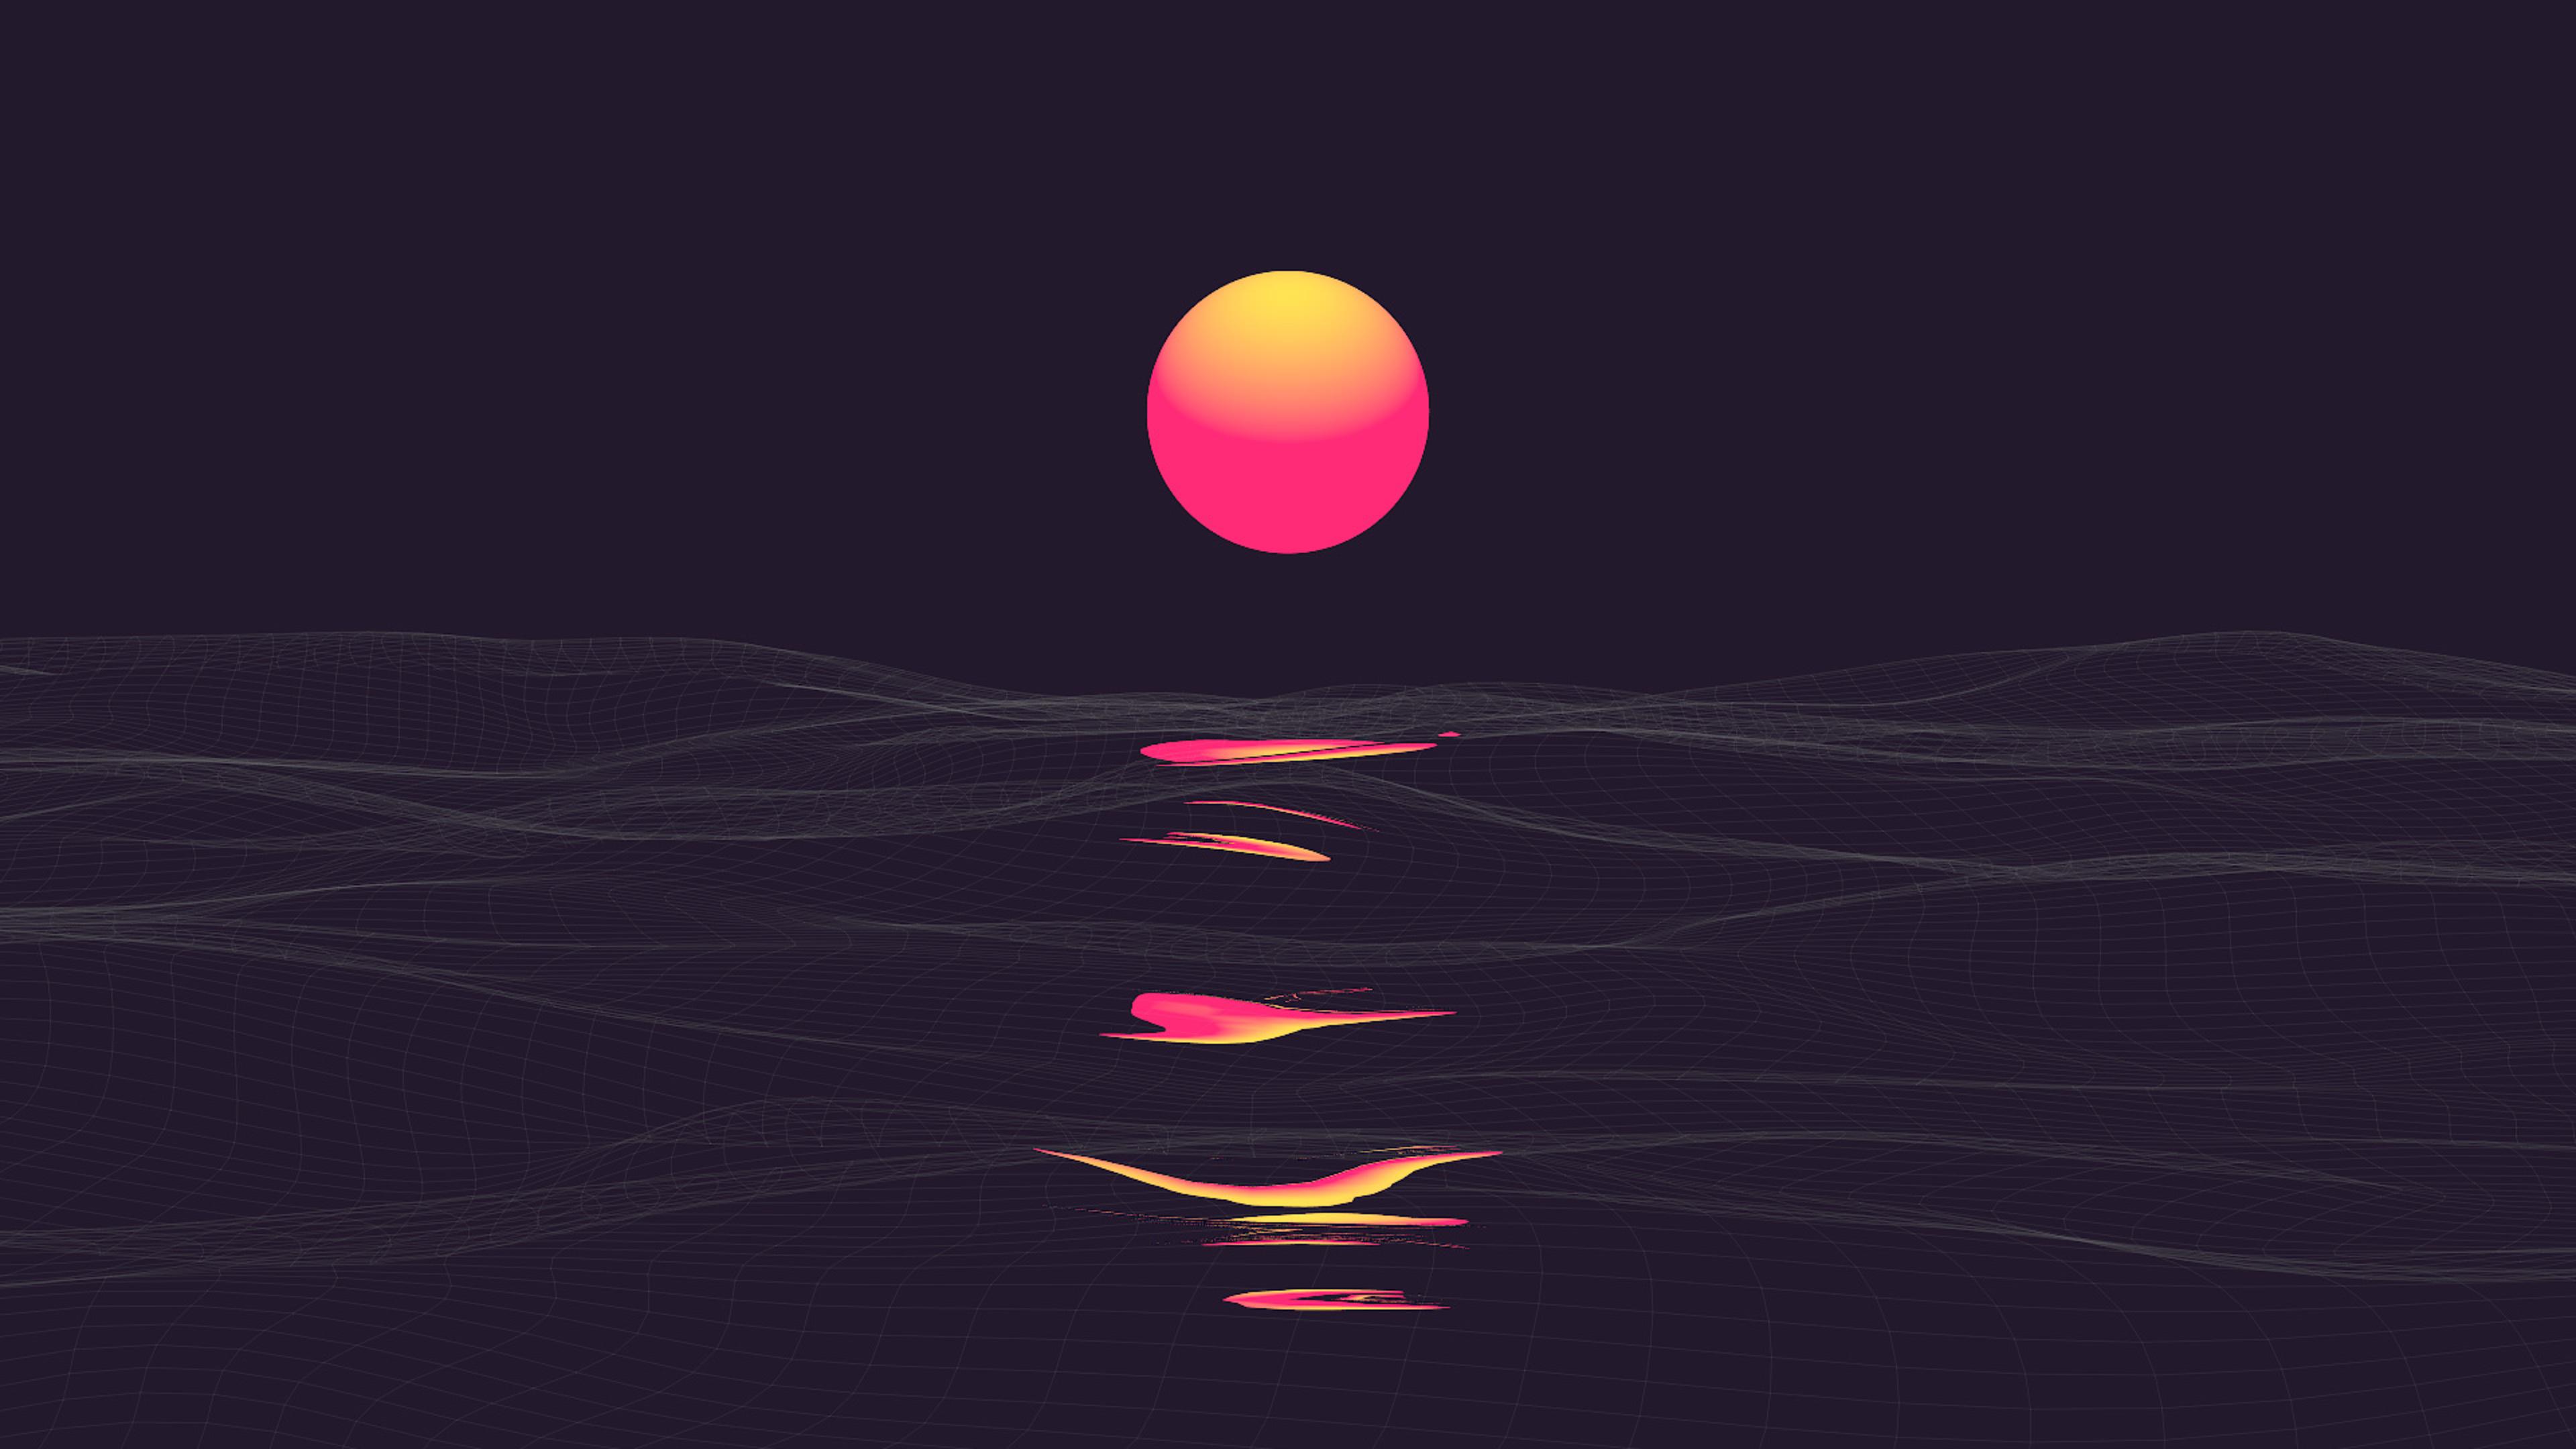 pink-retrowave-sunset-e1.jpg